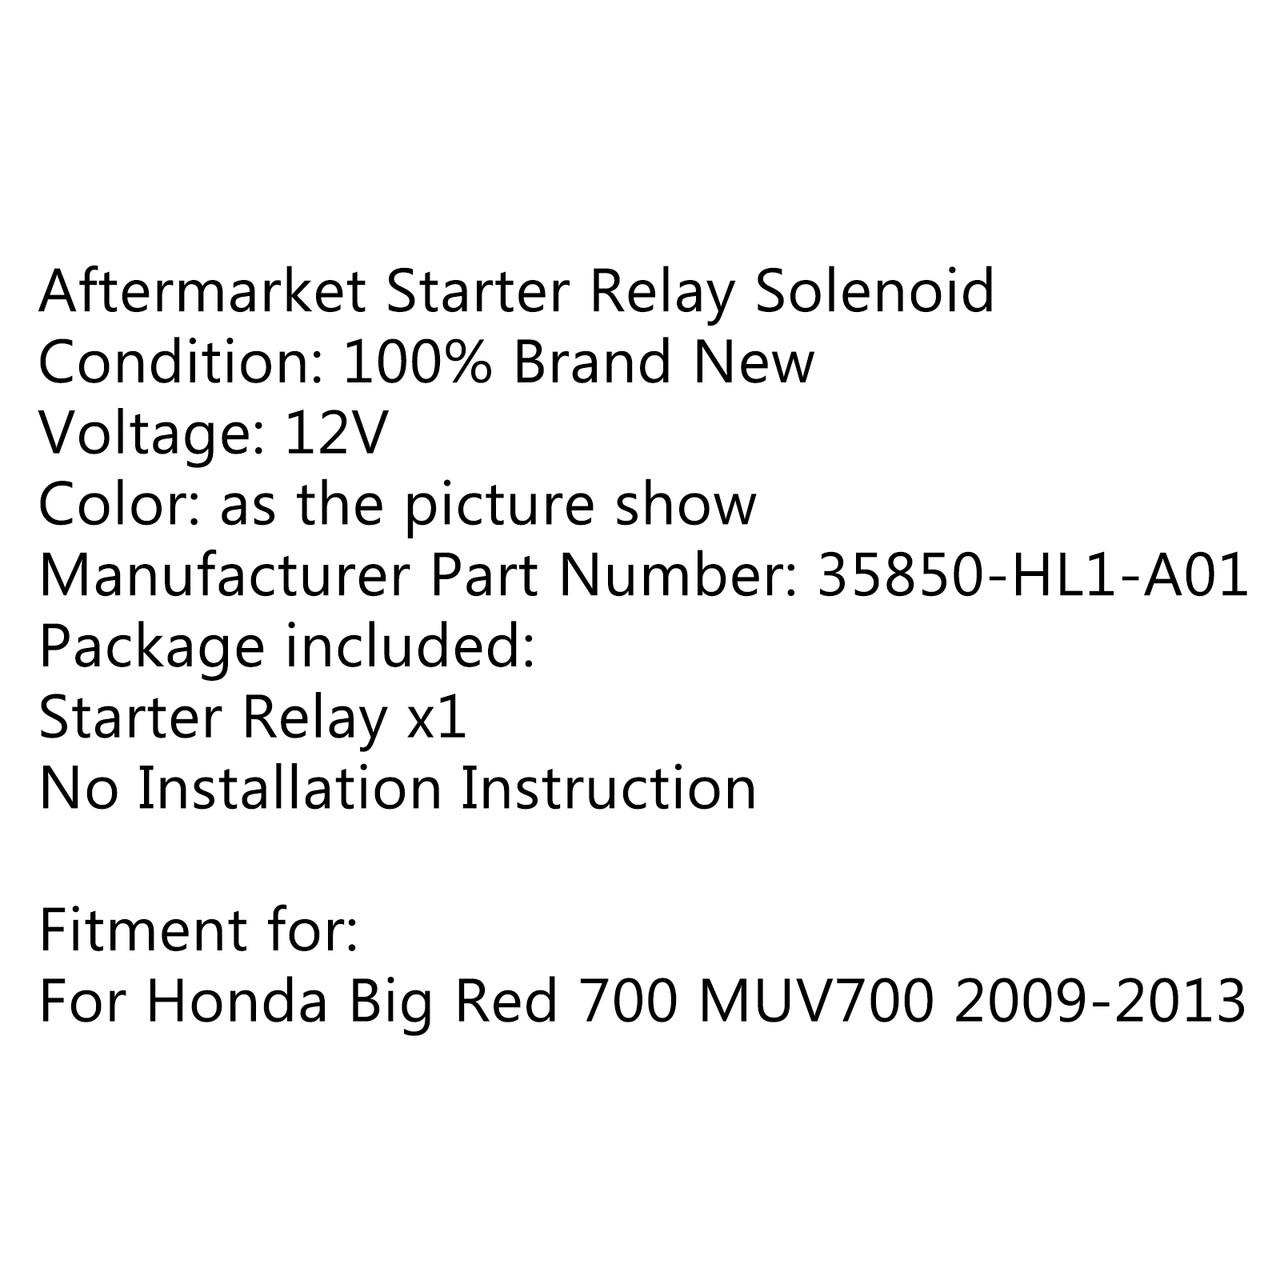 Starter Solenoid Relay Ignition For Honda Big Red 700 MUV700 (2009-2013)